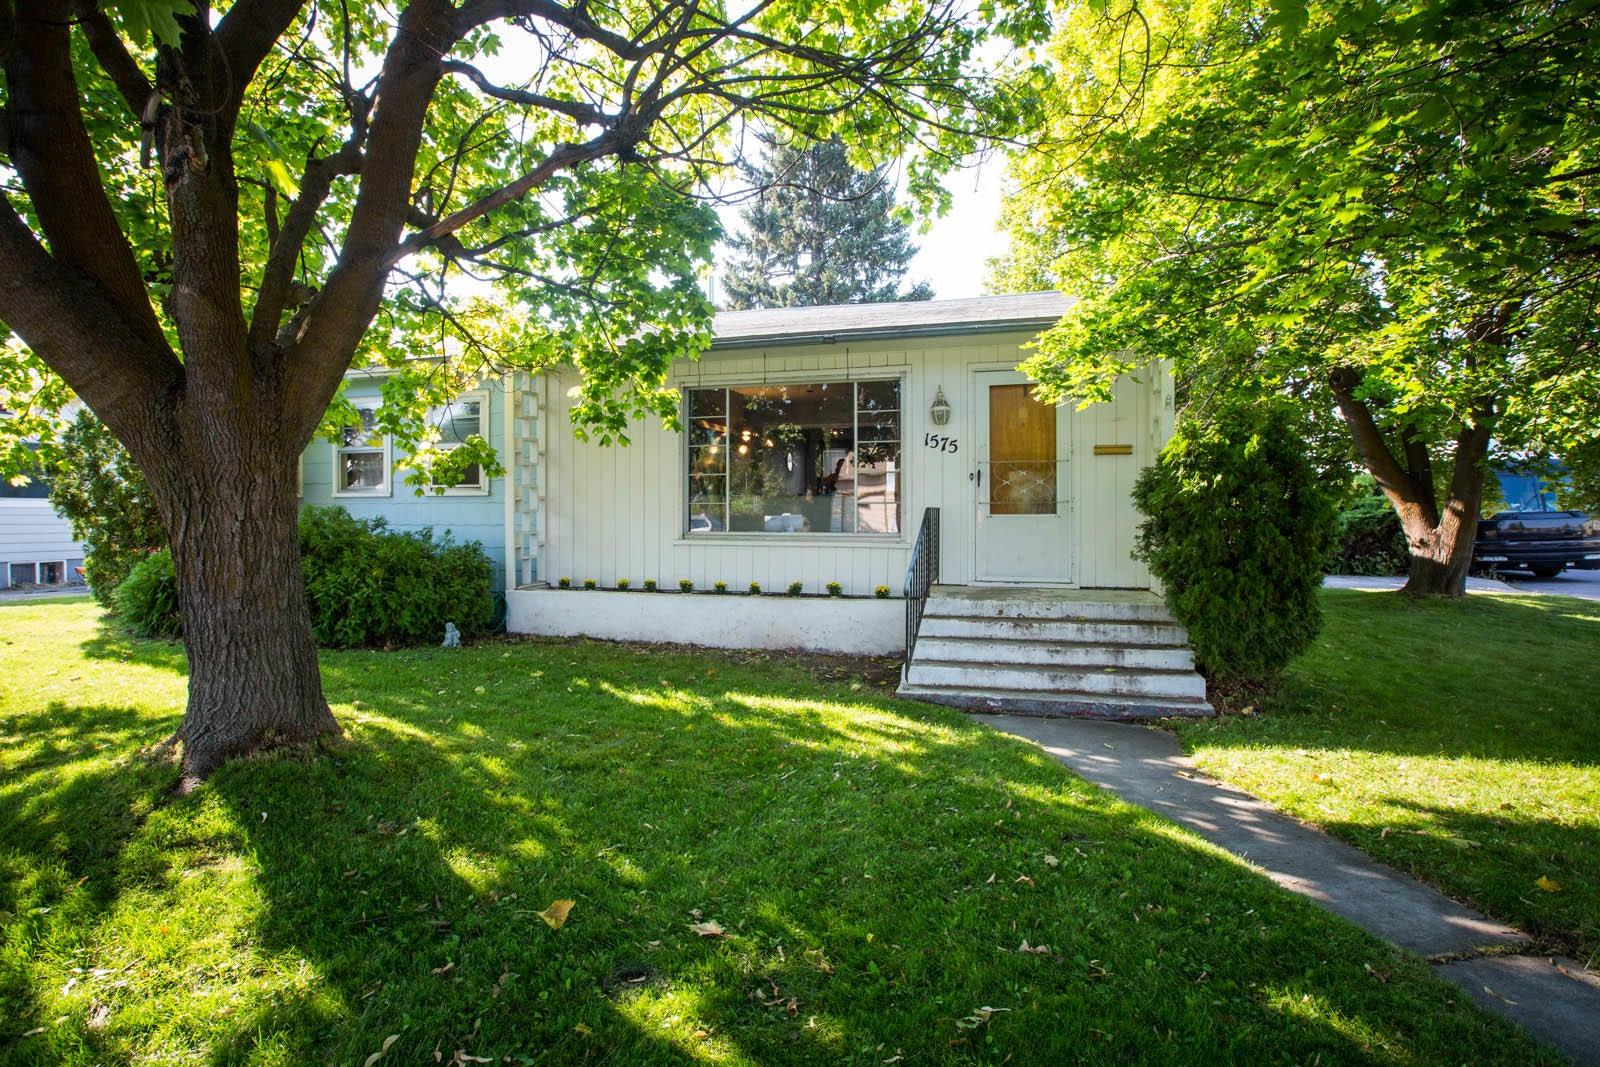 1575 W Sussex Avenue, Missoula, MT 59801